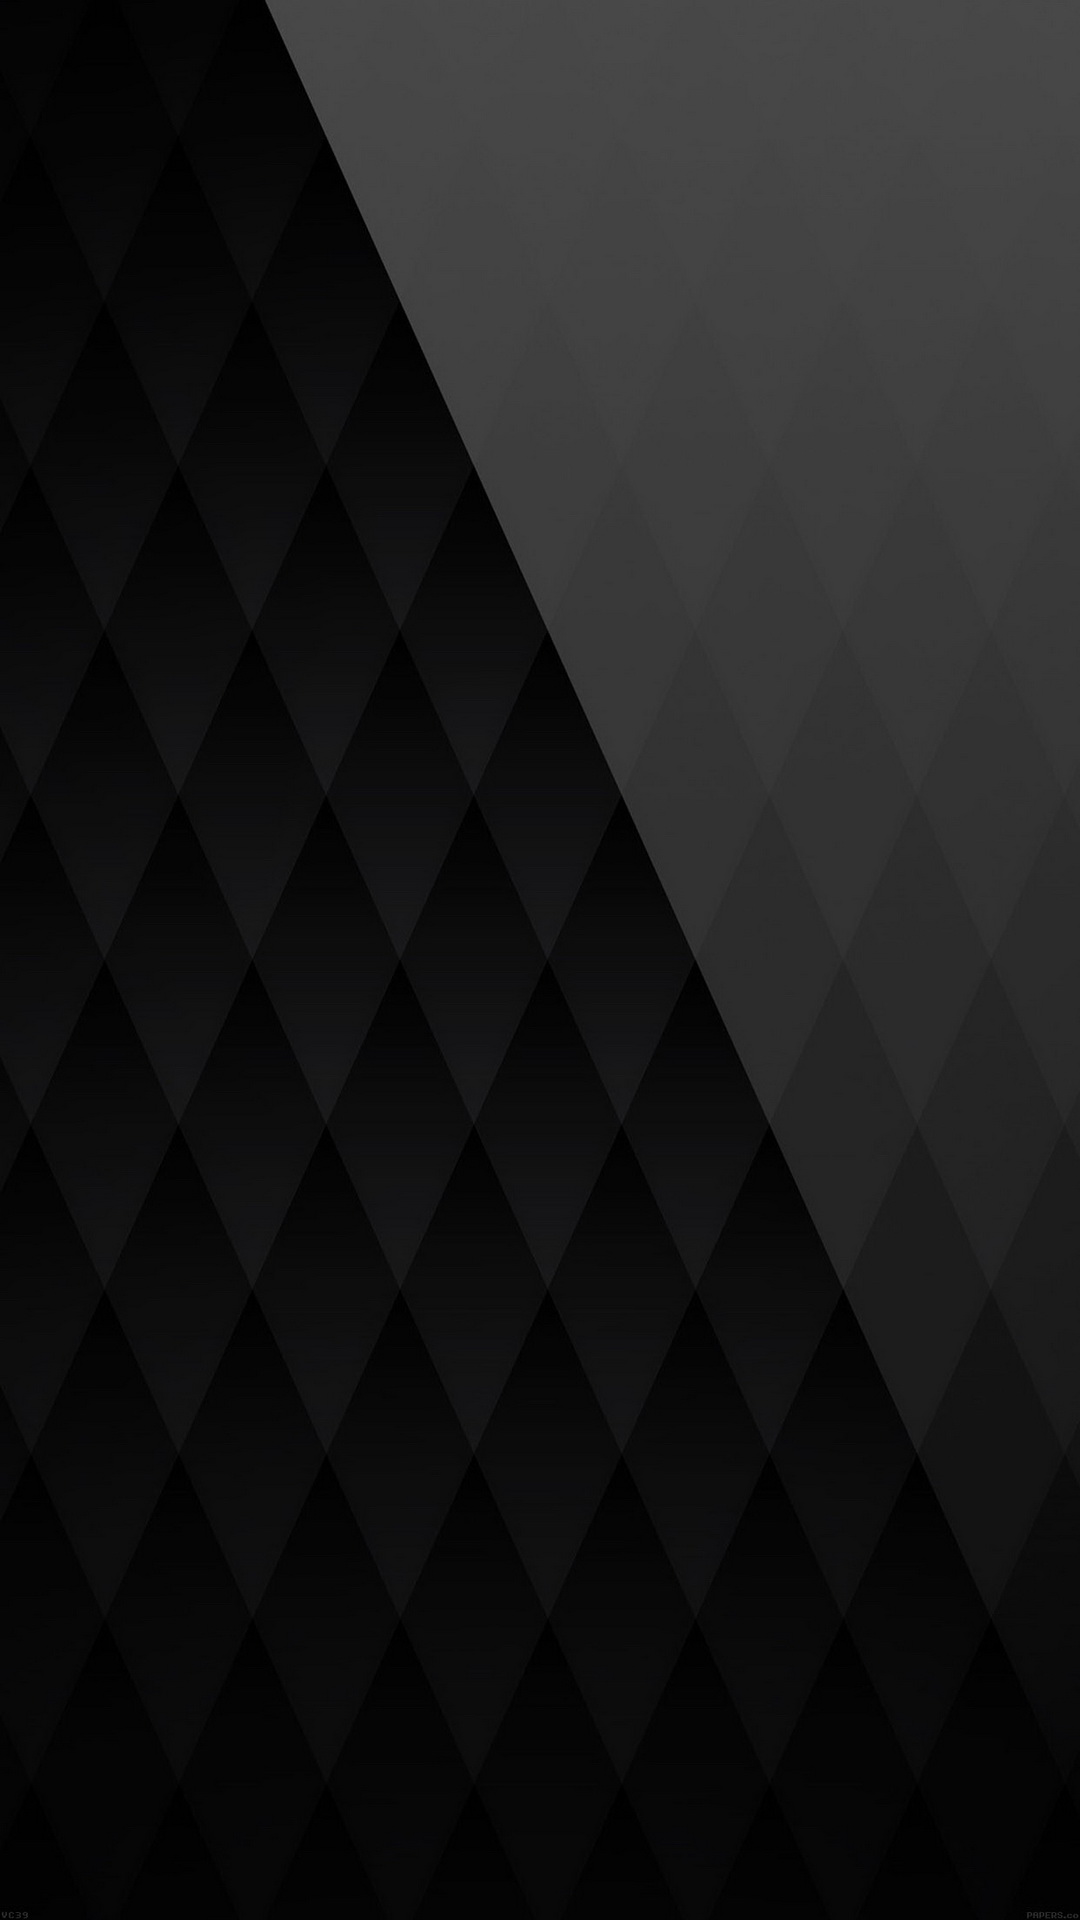 Black diamond pattern   Best HTC M9 wallpapers 1080x1920